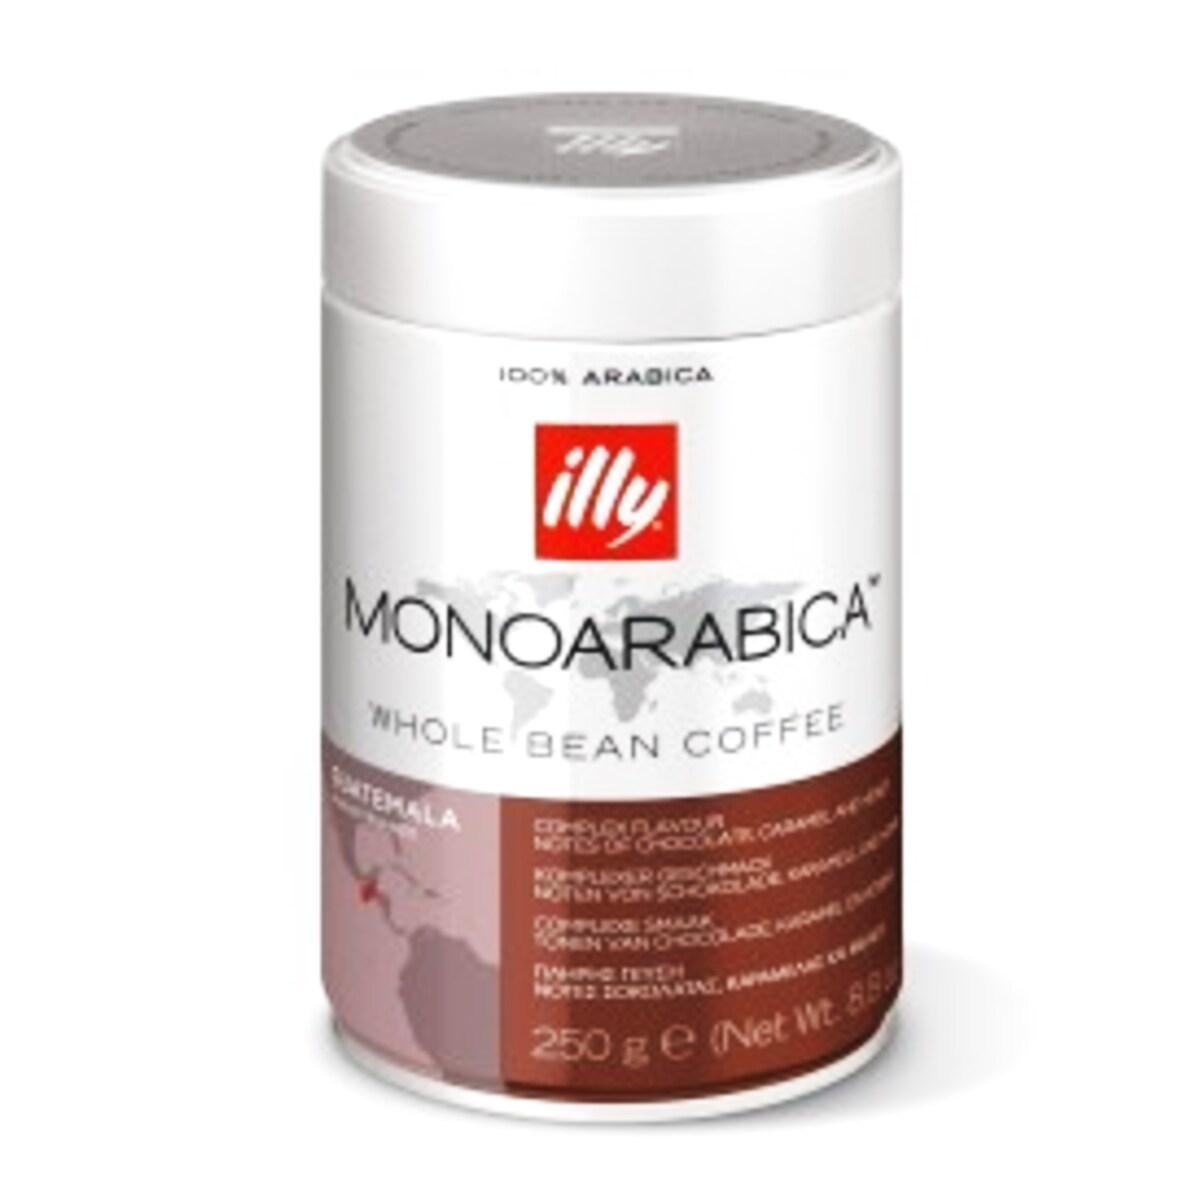 illy Espresso Monoarabica Guatemala - καφές σε κόκκους 250 γρ.